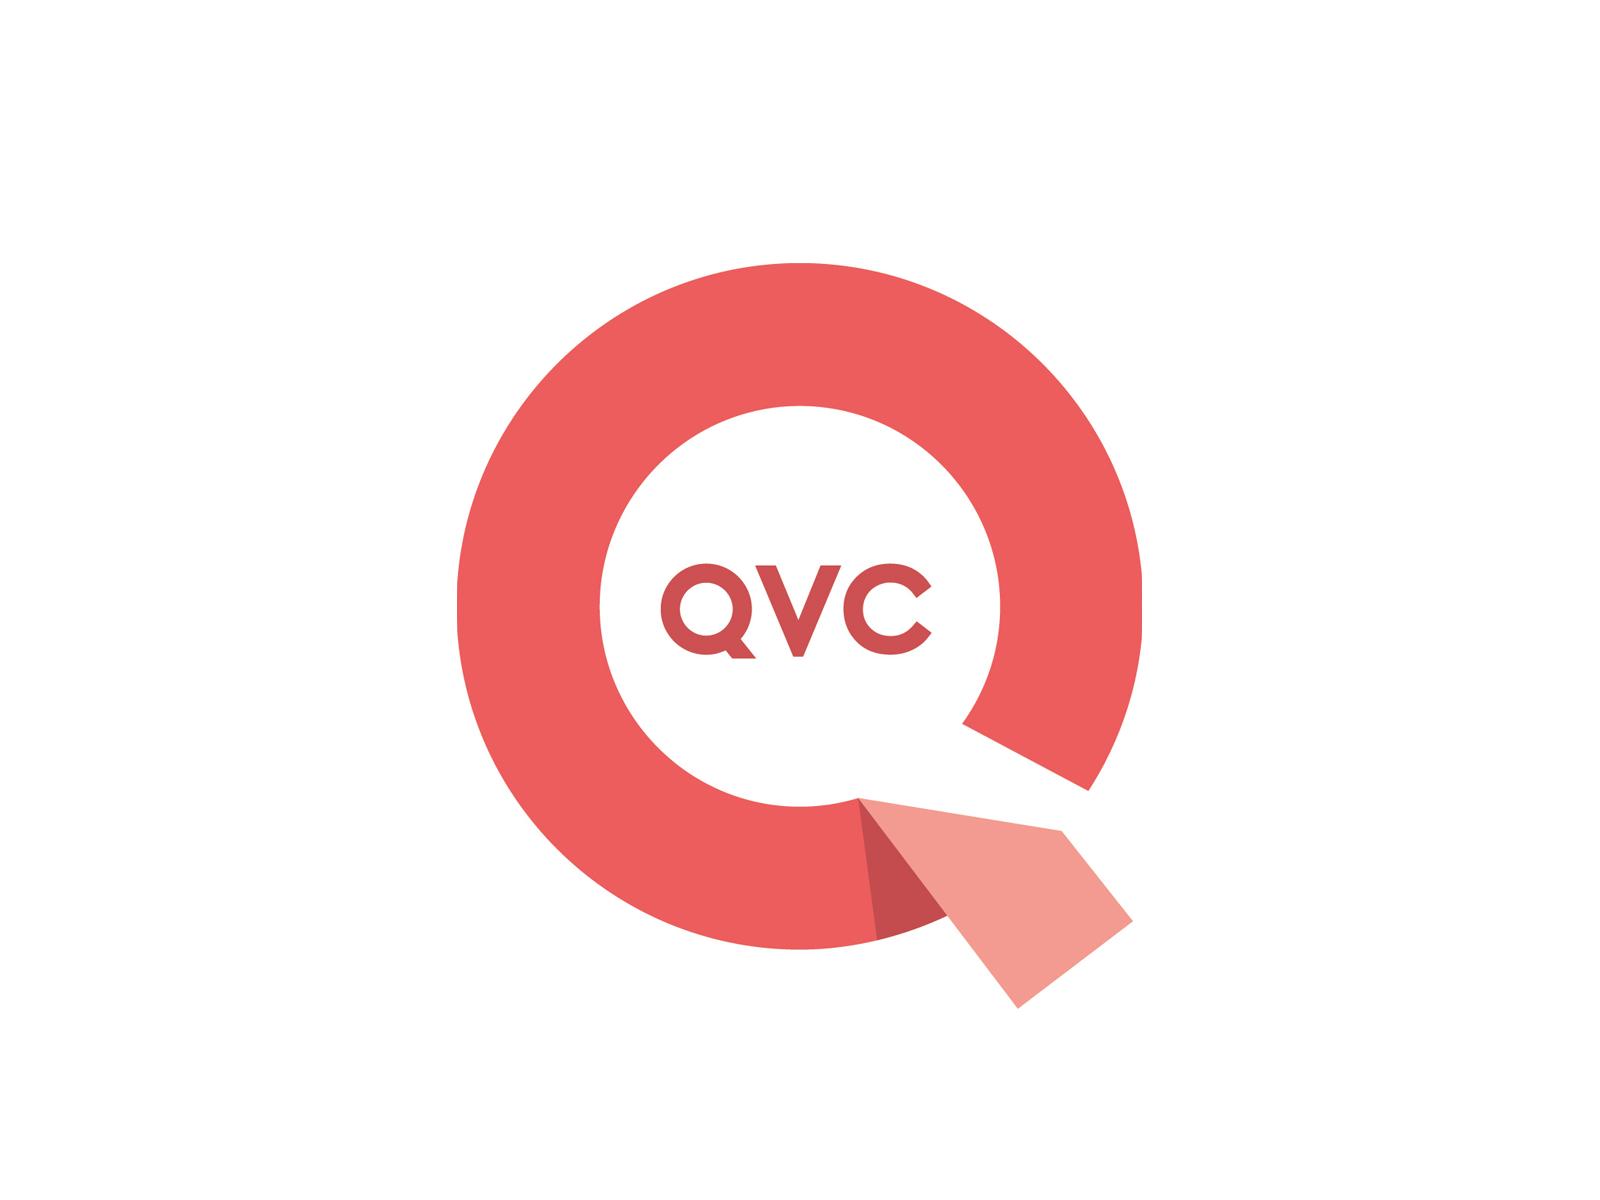 QVCLogo_JOY_RGB.jpg